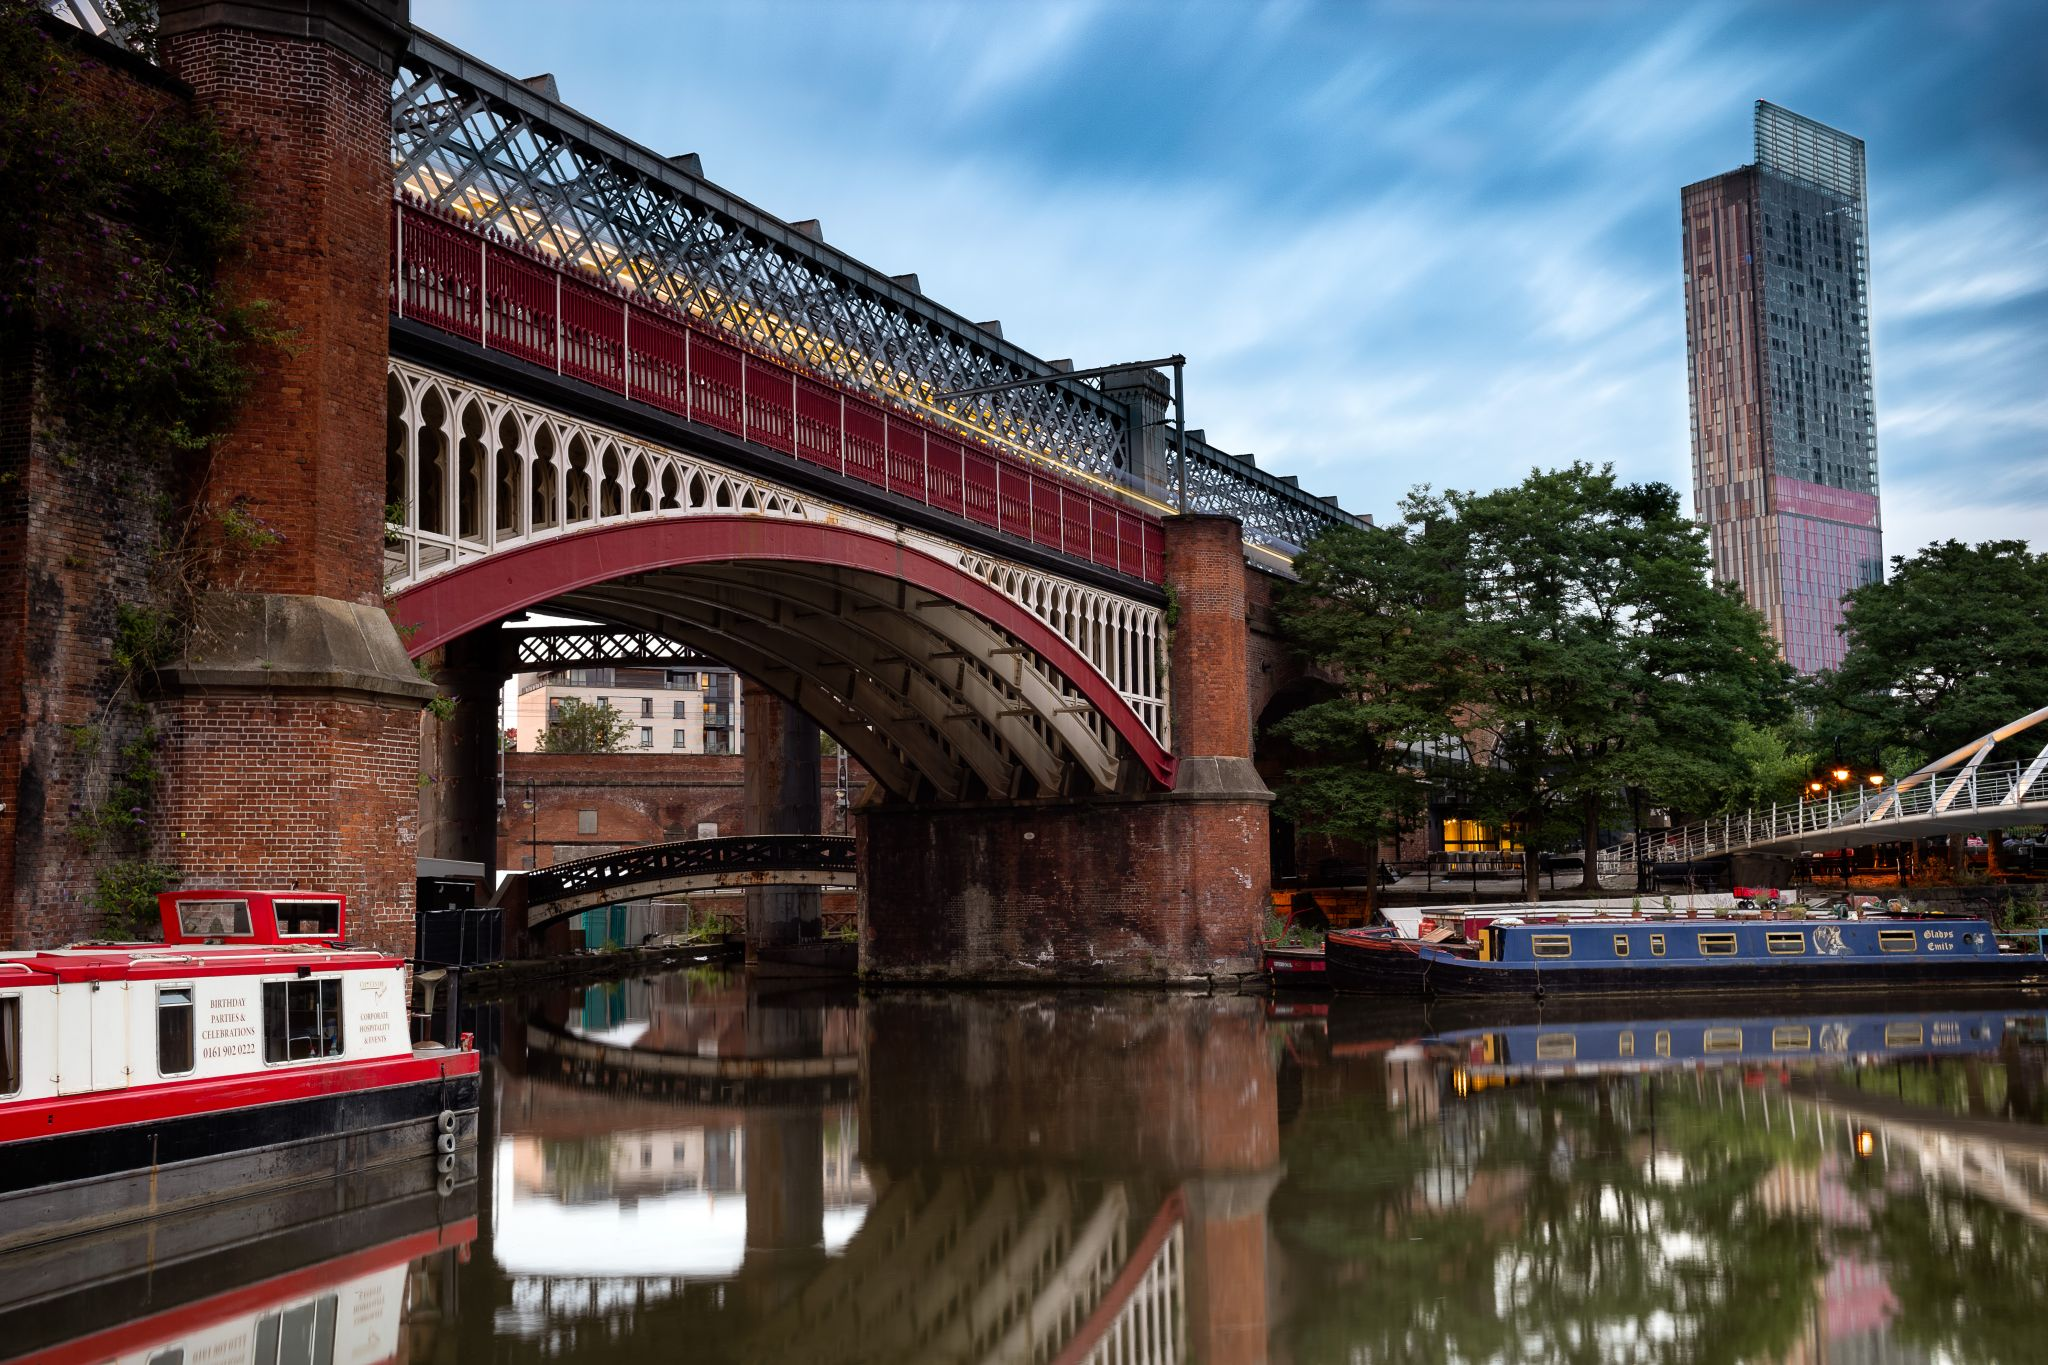 Manchester Slate Wharf, United Kingdom